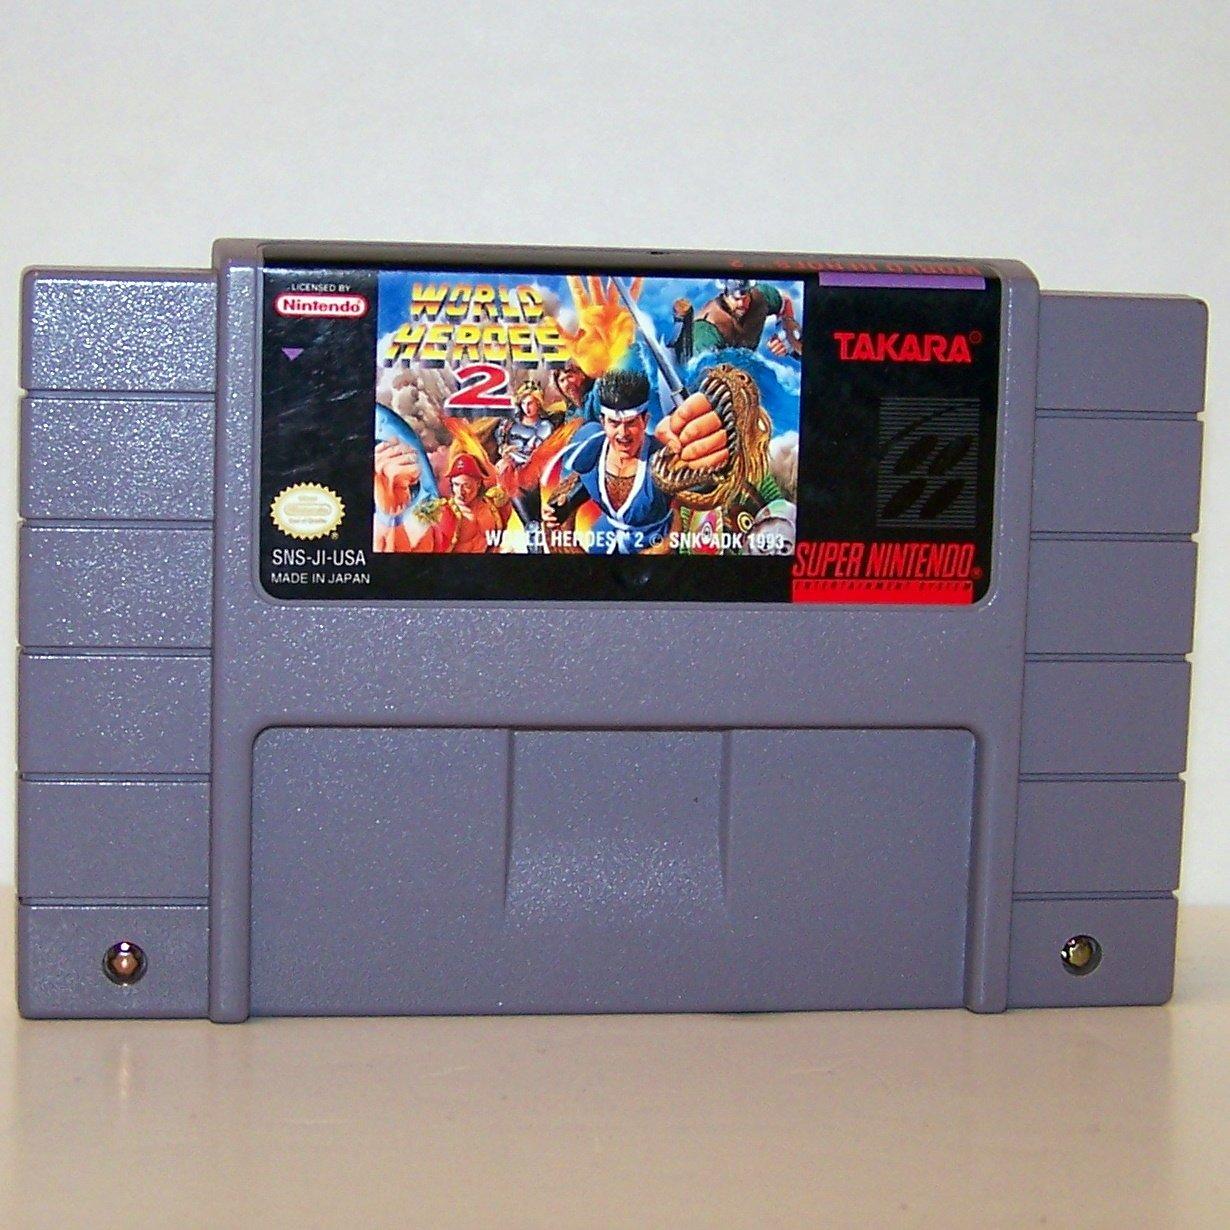 World Heroes 2 Super Nintendo Game Cartridge